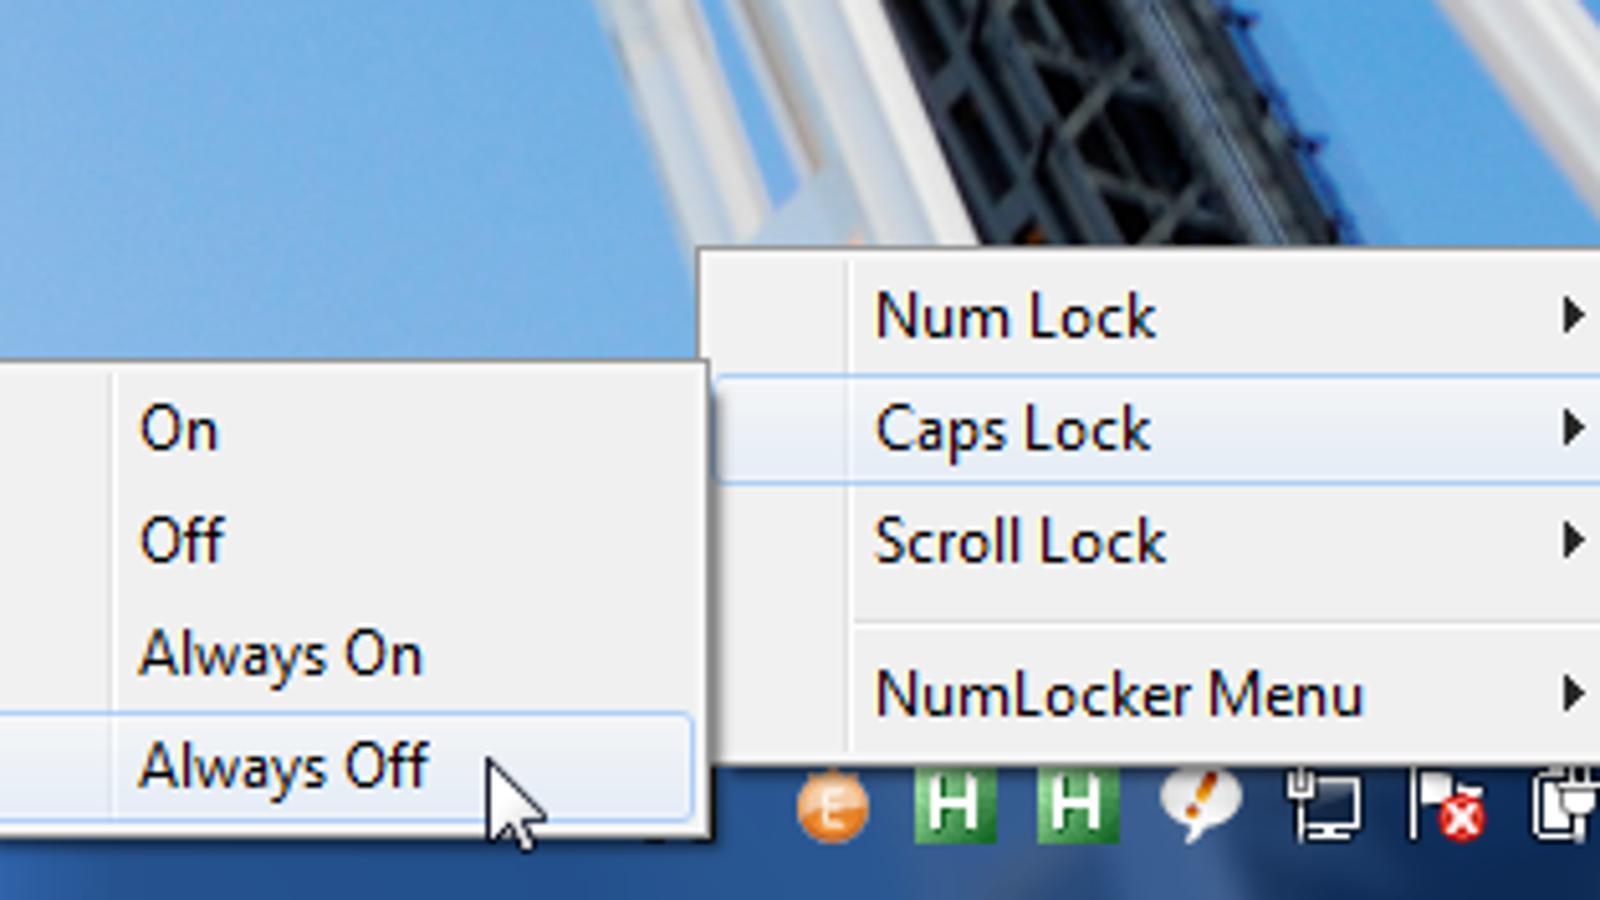 NumLocker Disables the Caps Lock Key